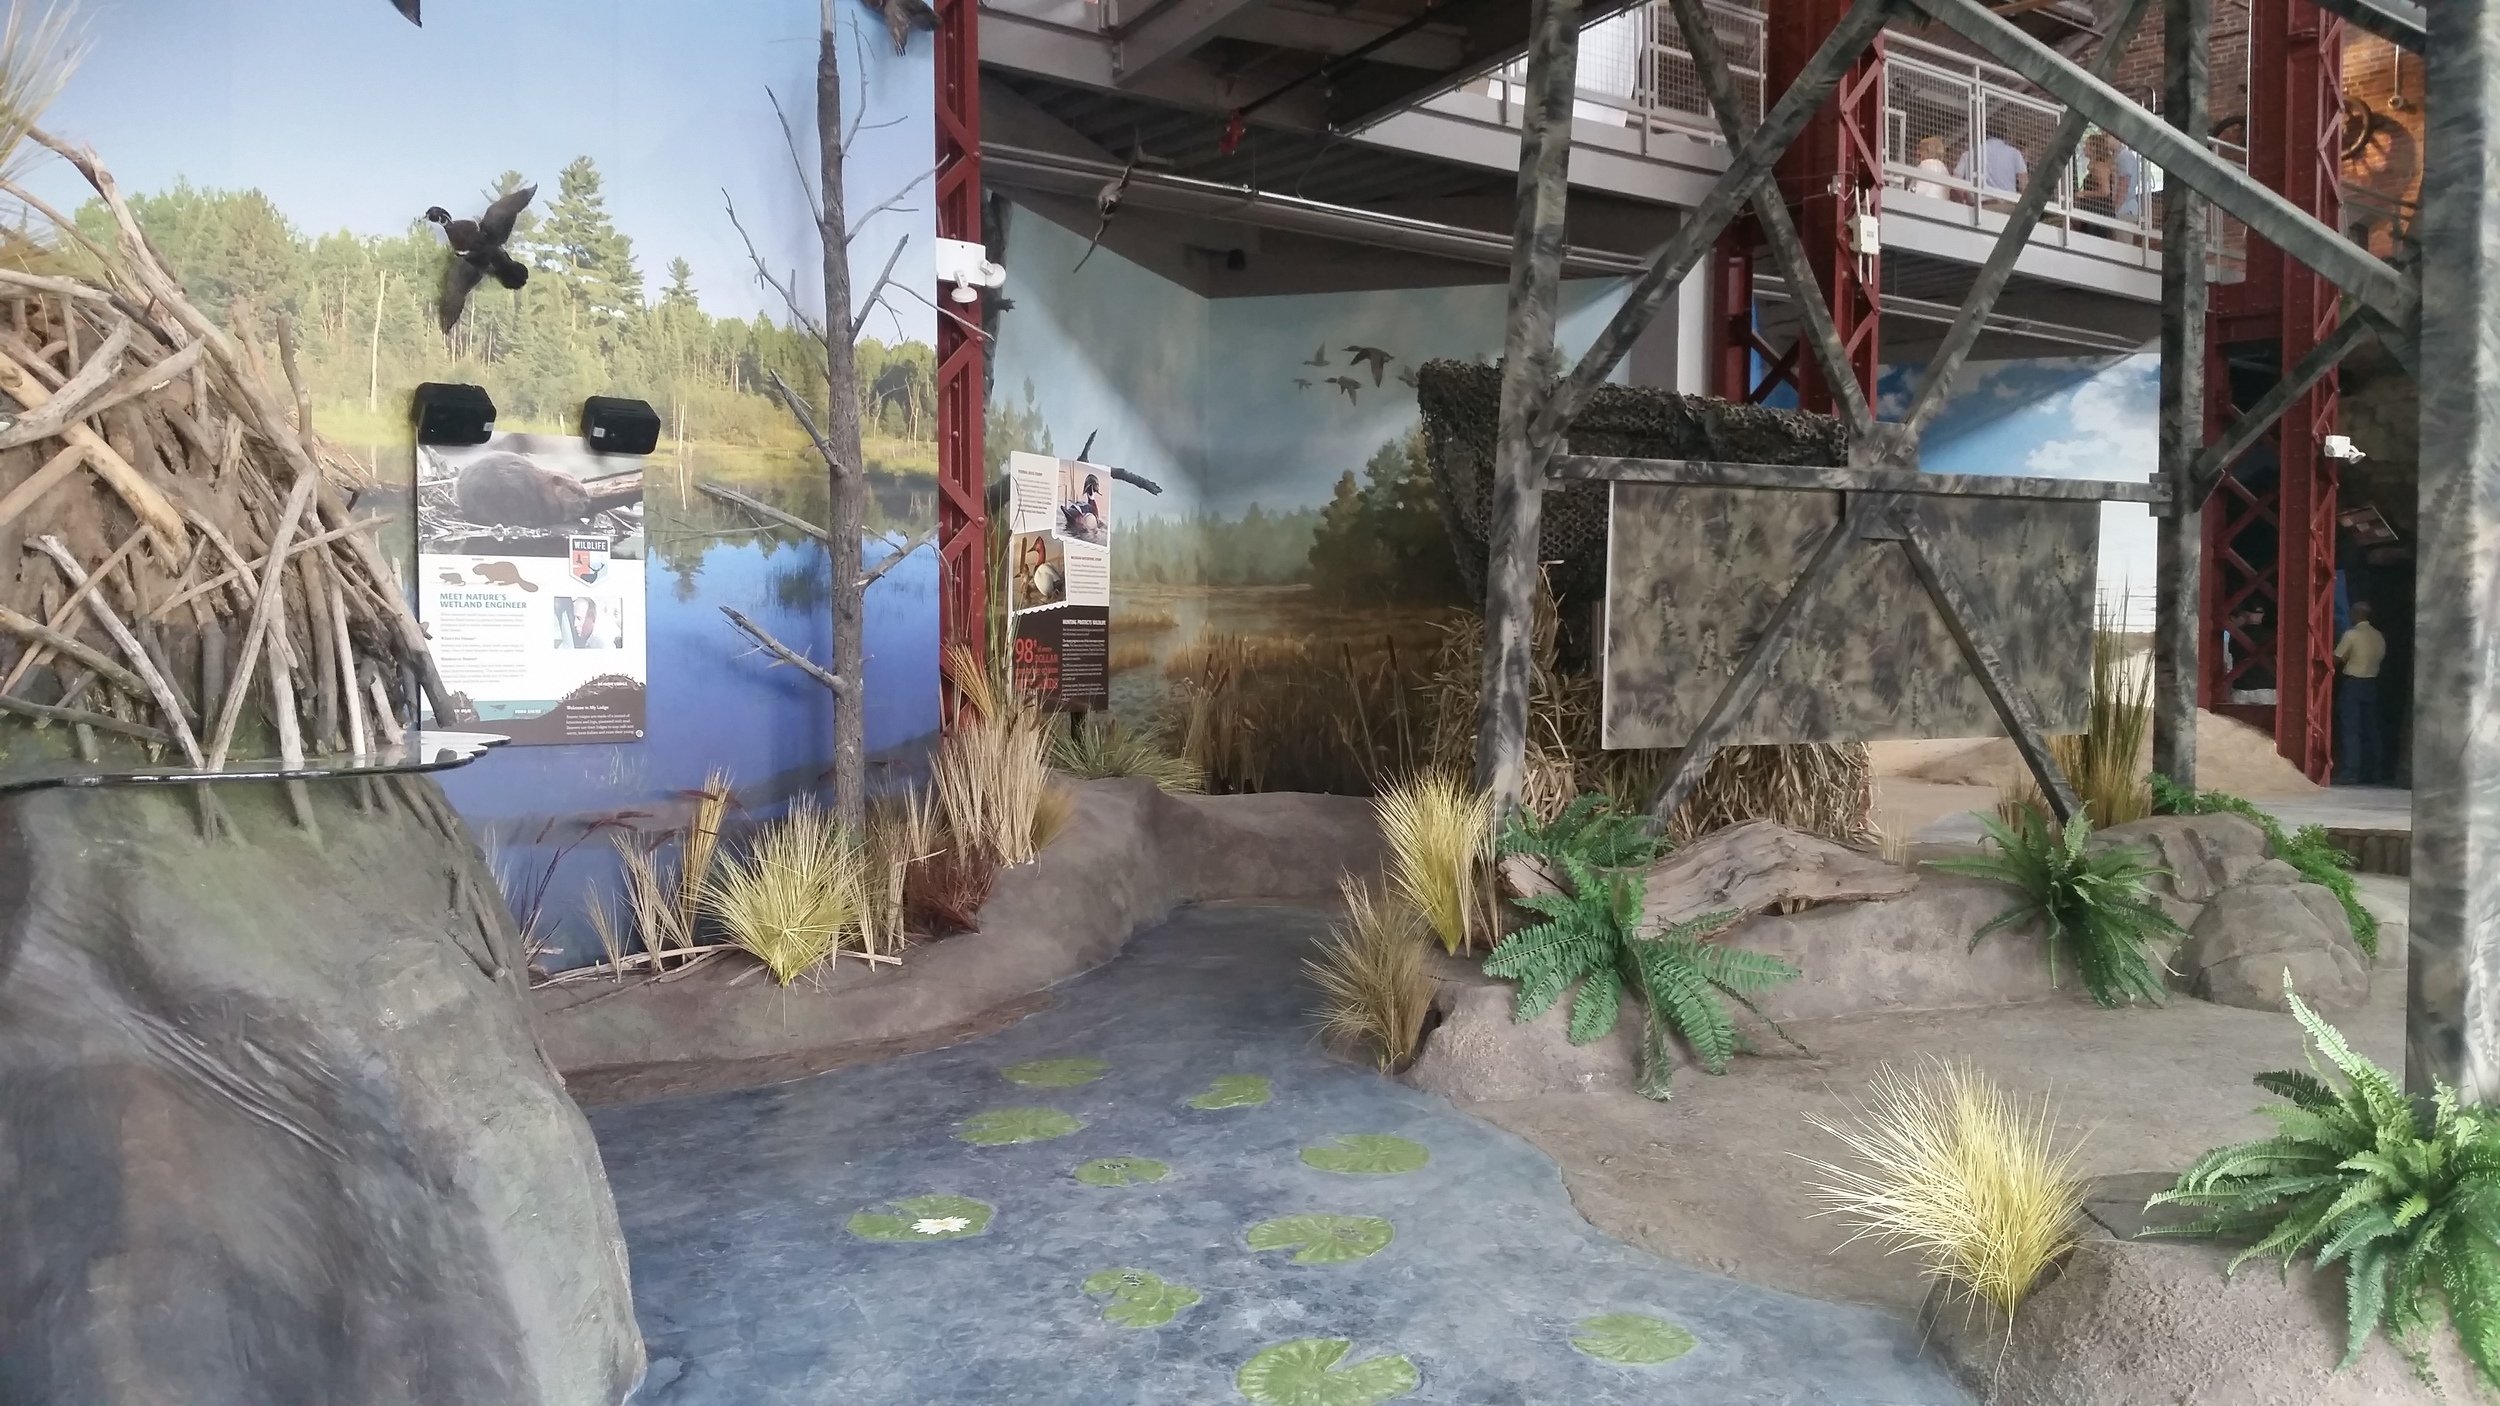 wetland exhibit